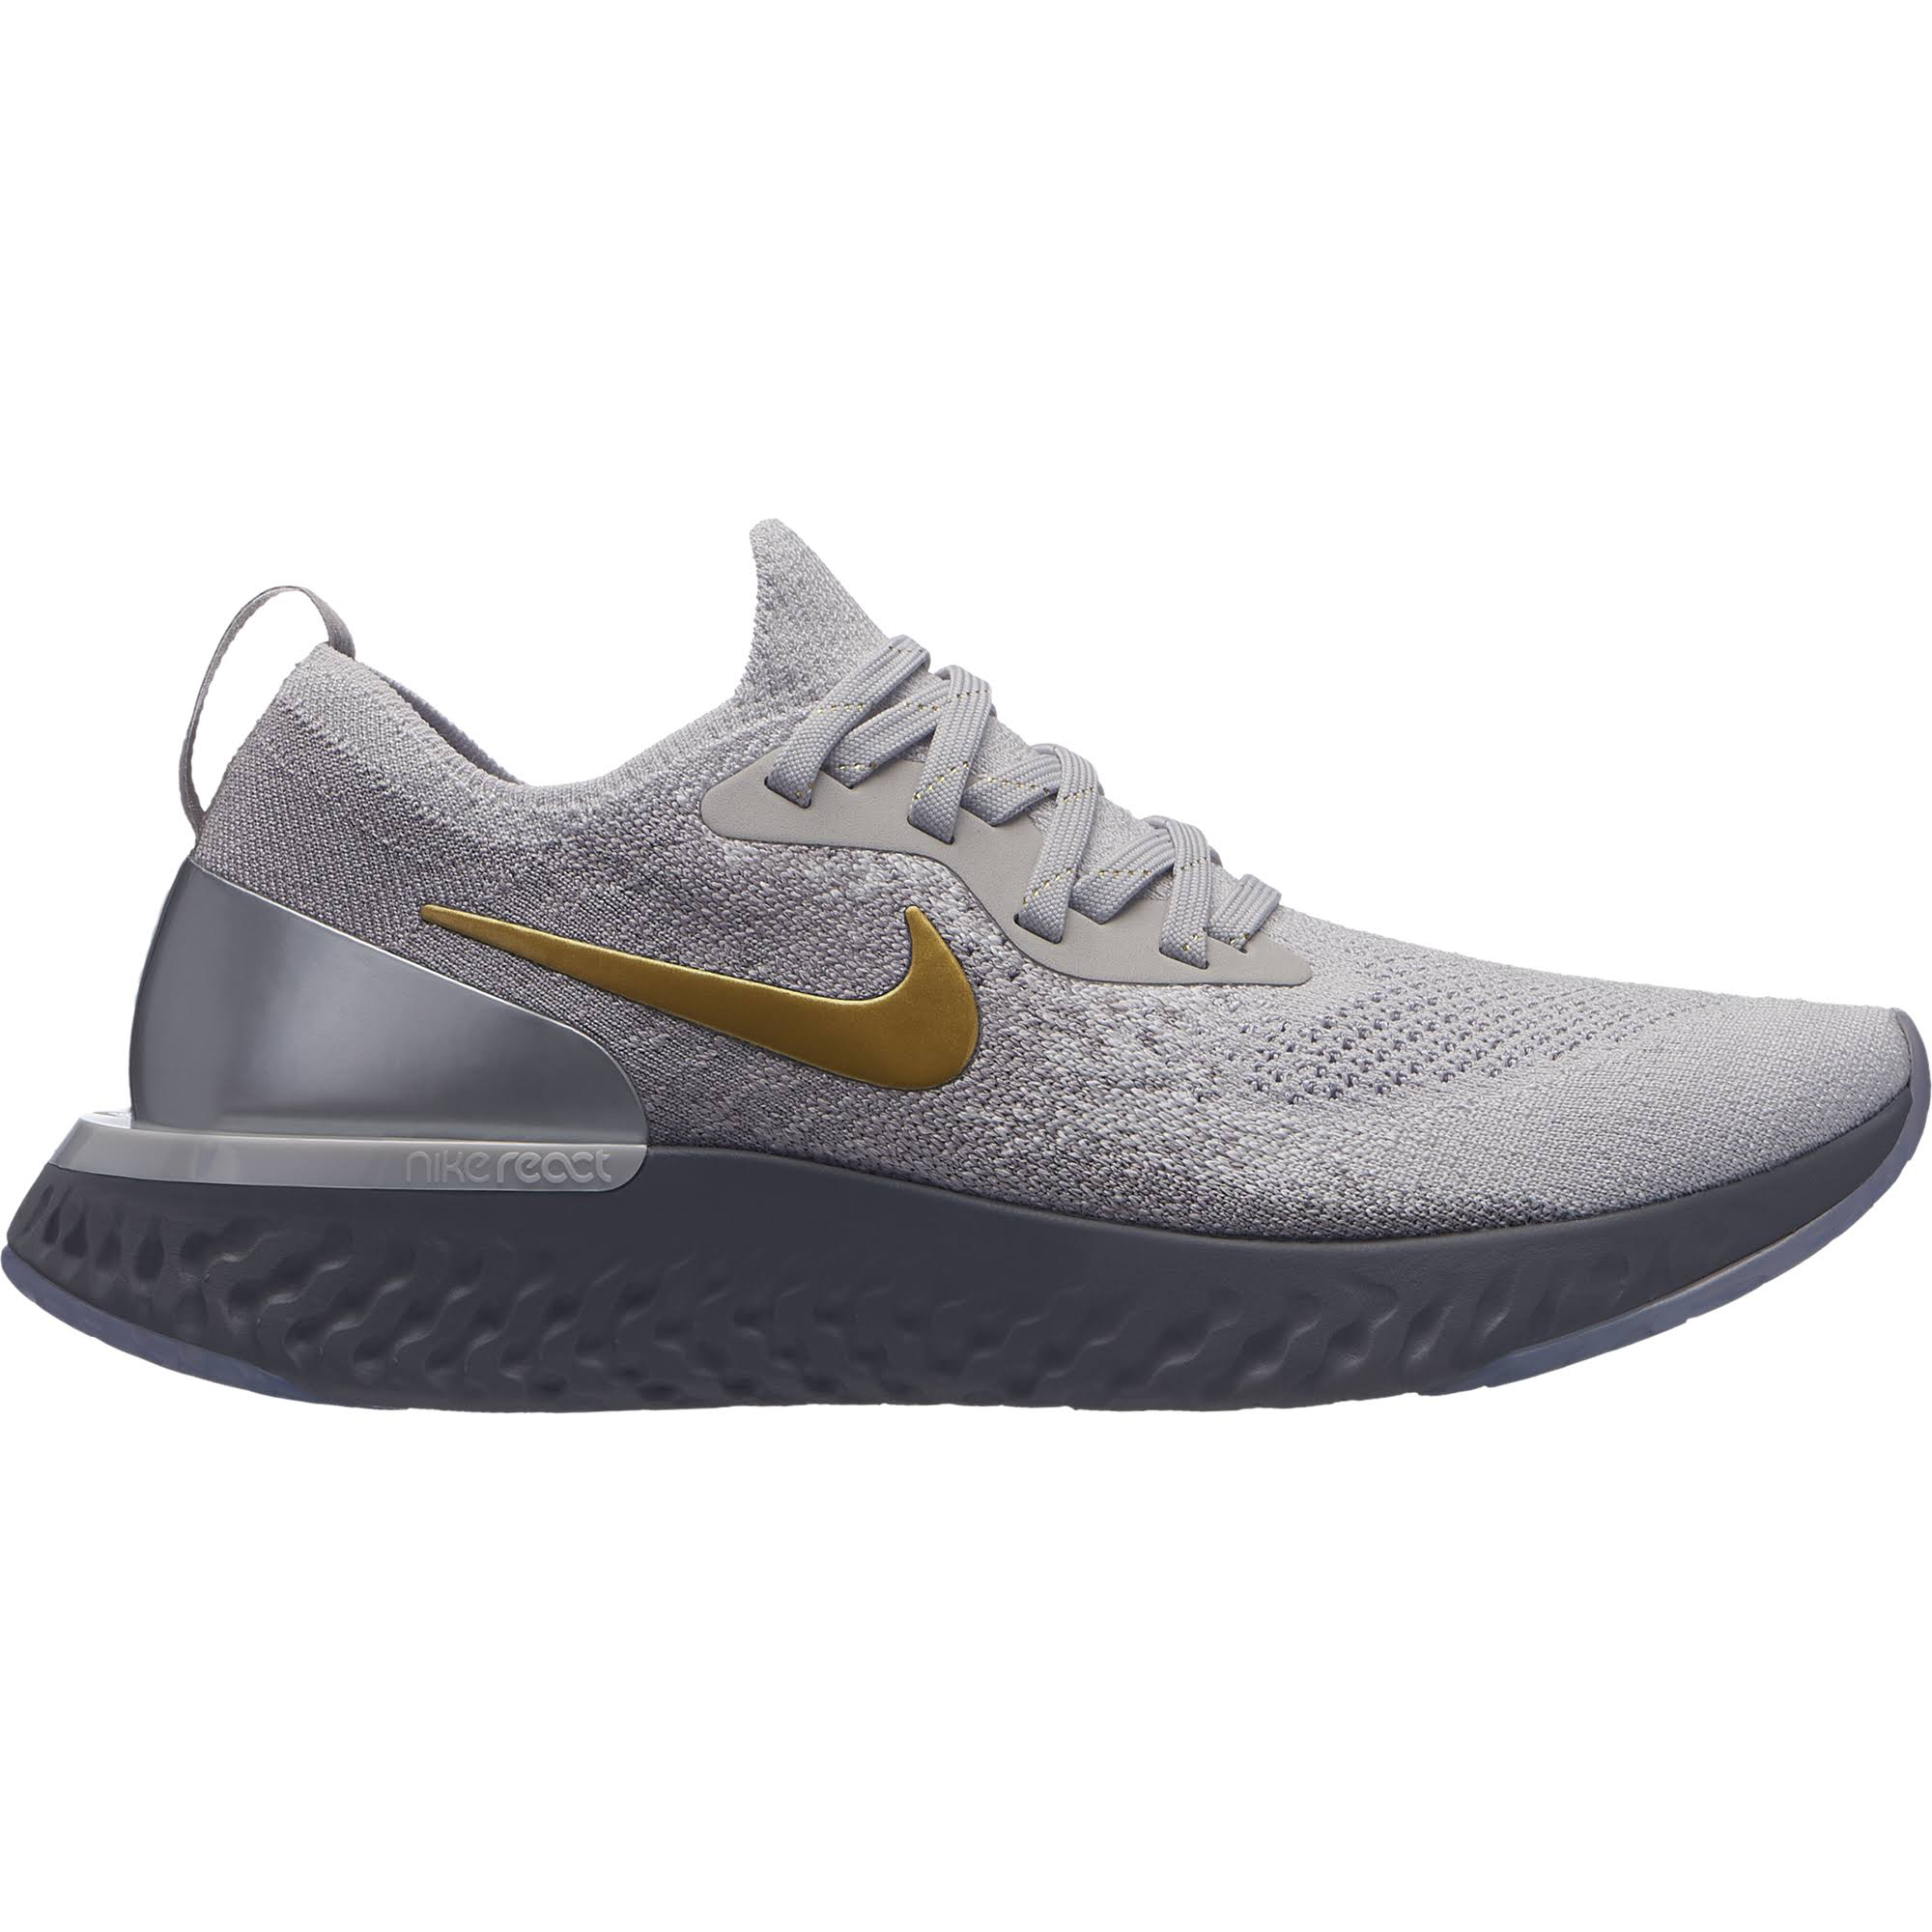 Taglia Flyknit Epic da 6 Nike Vast GreyDonna running React Scarpa qjLA435R